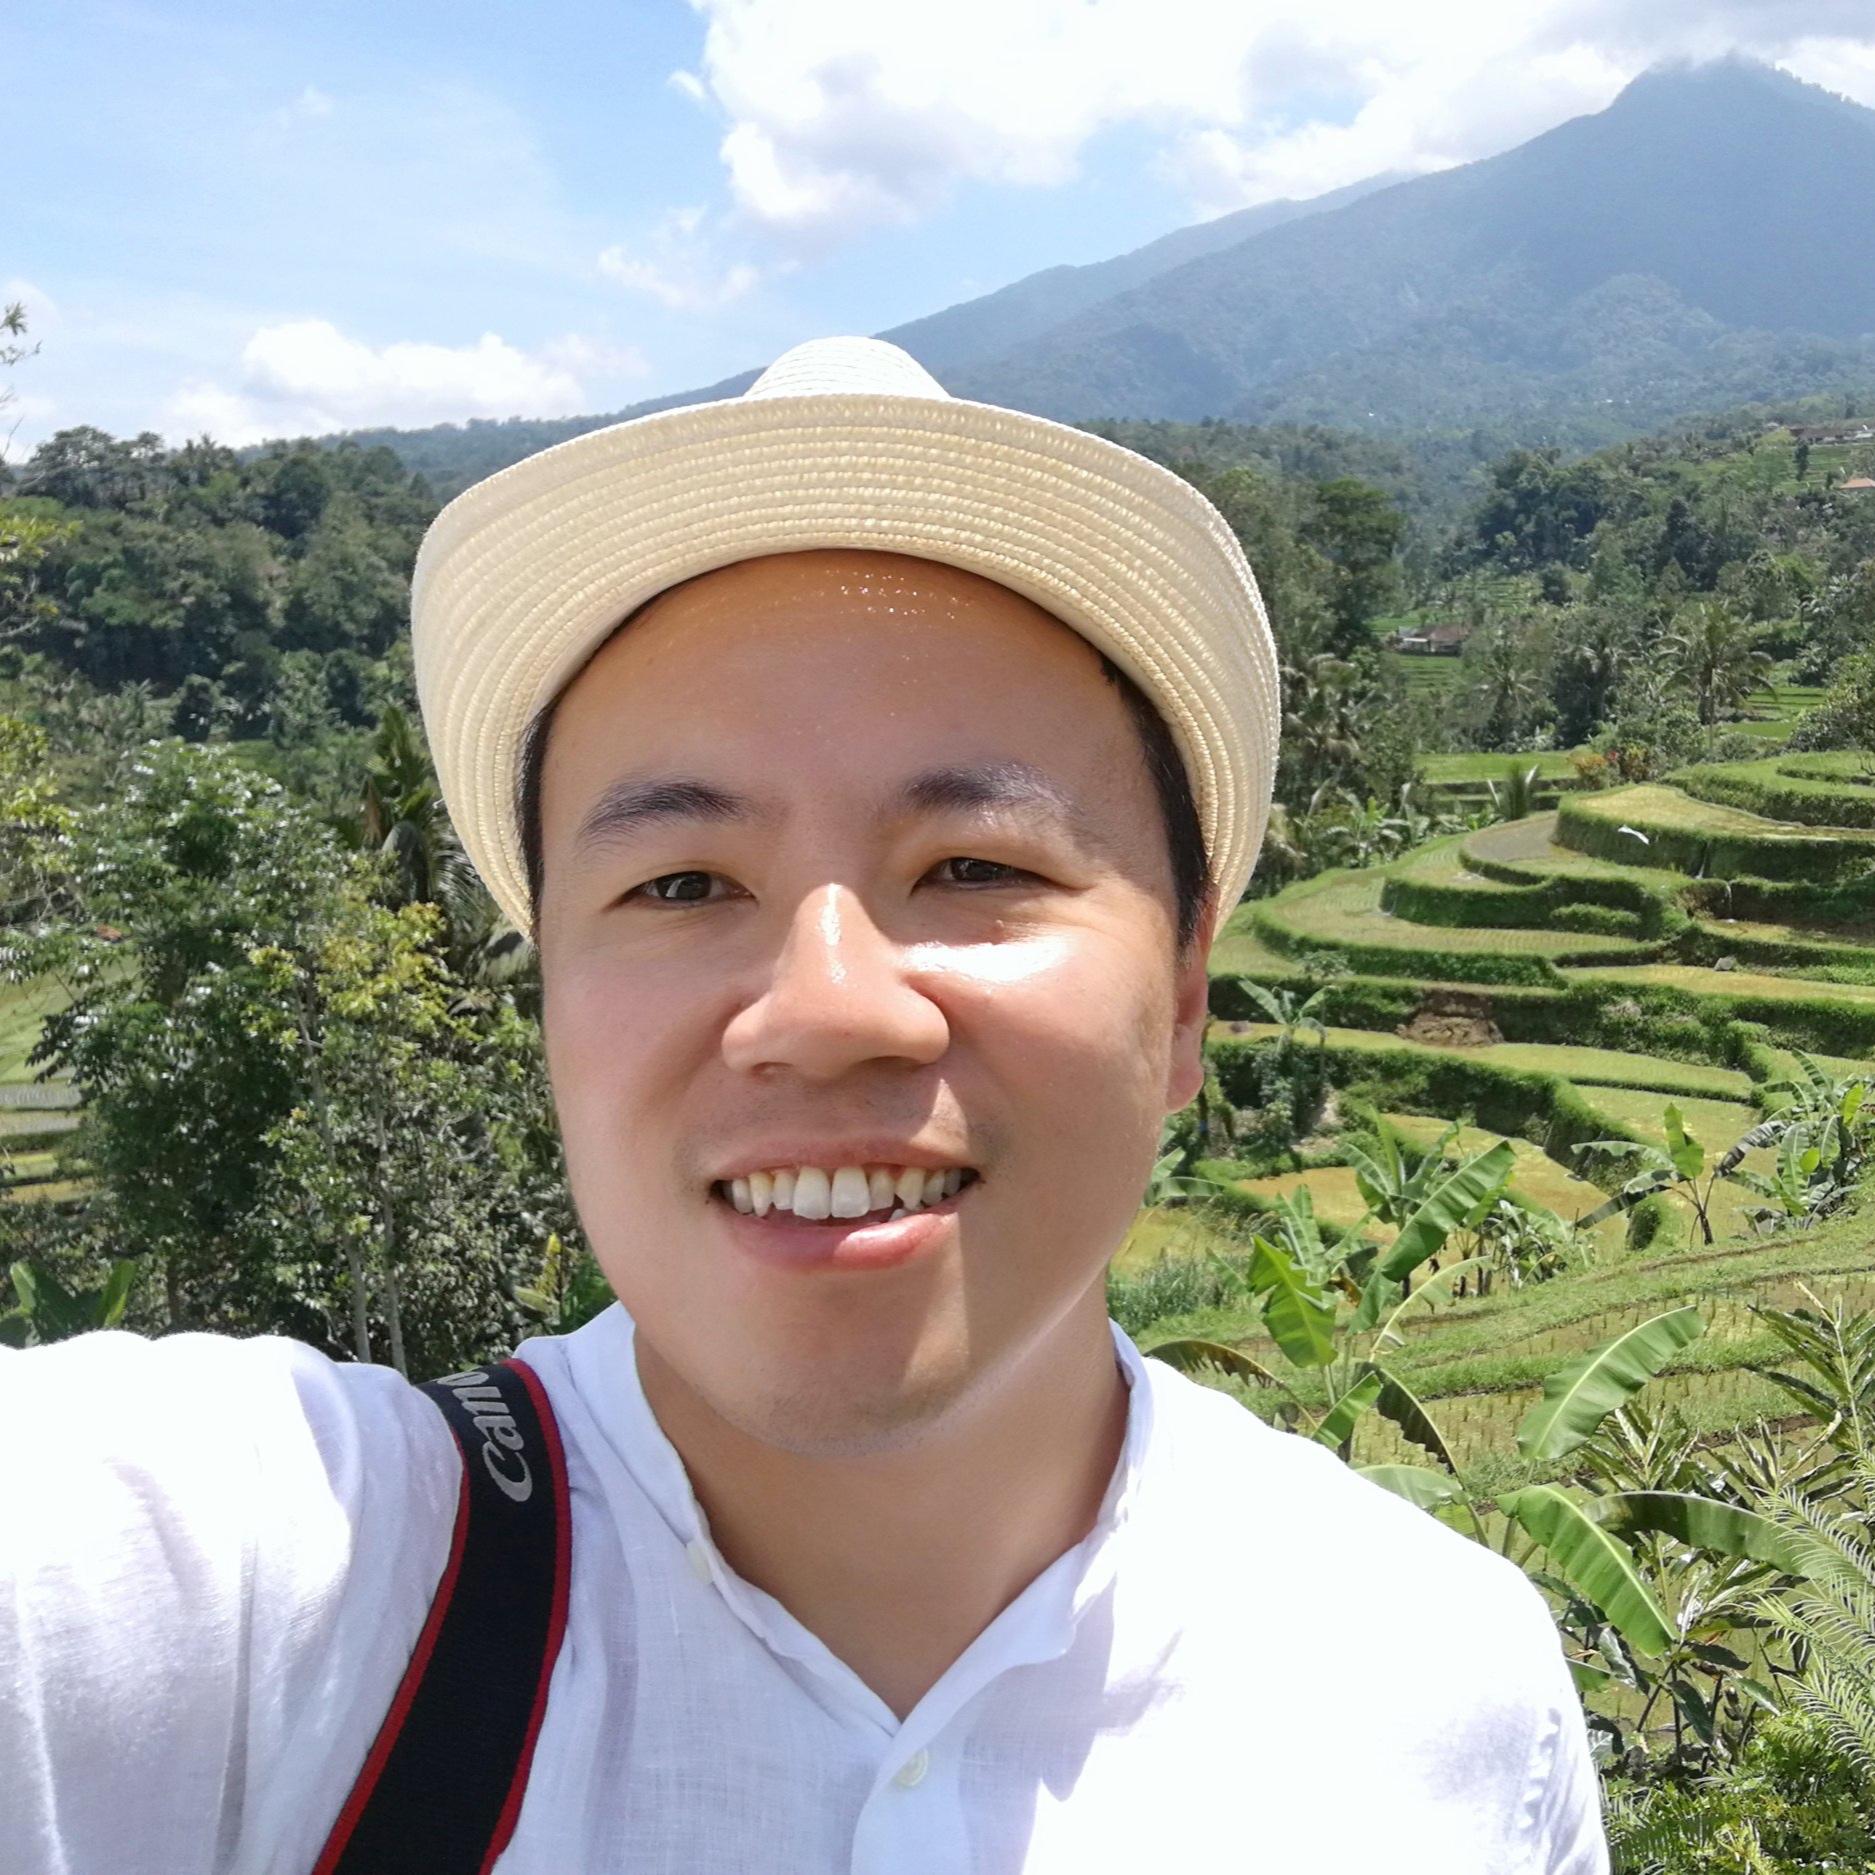 Ricky at the heavenly Bali Island.